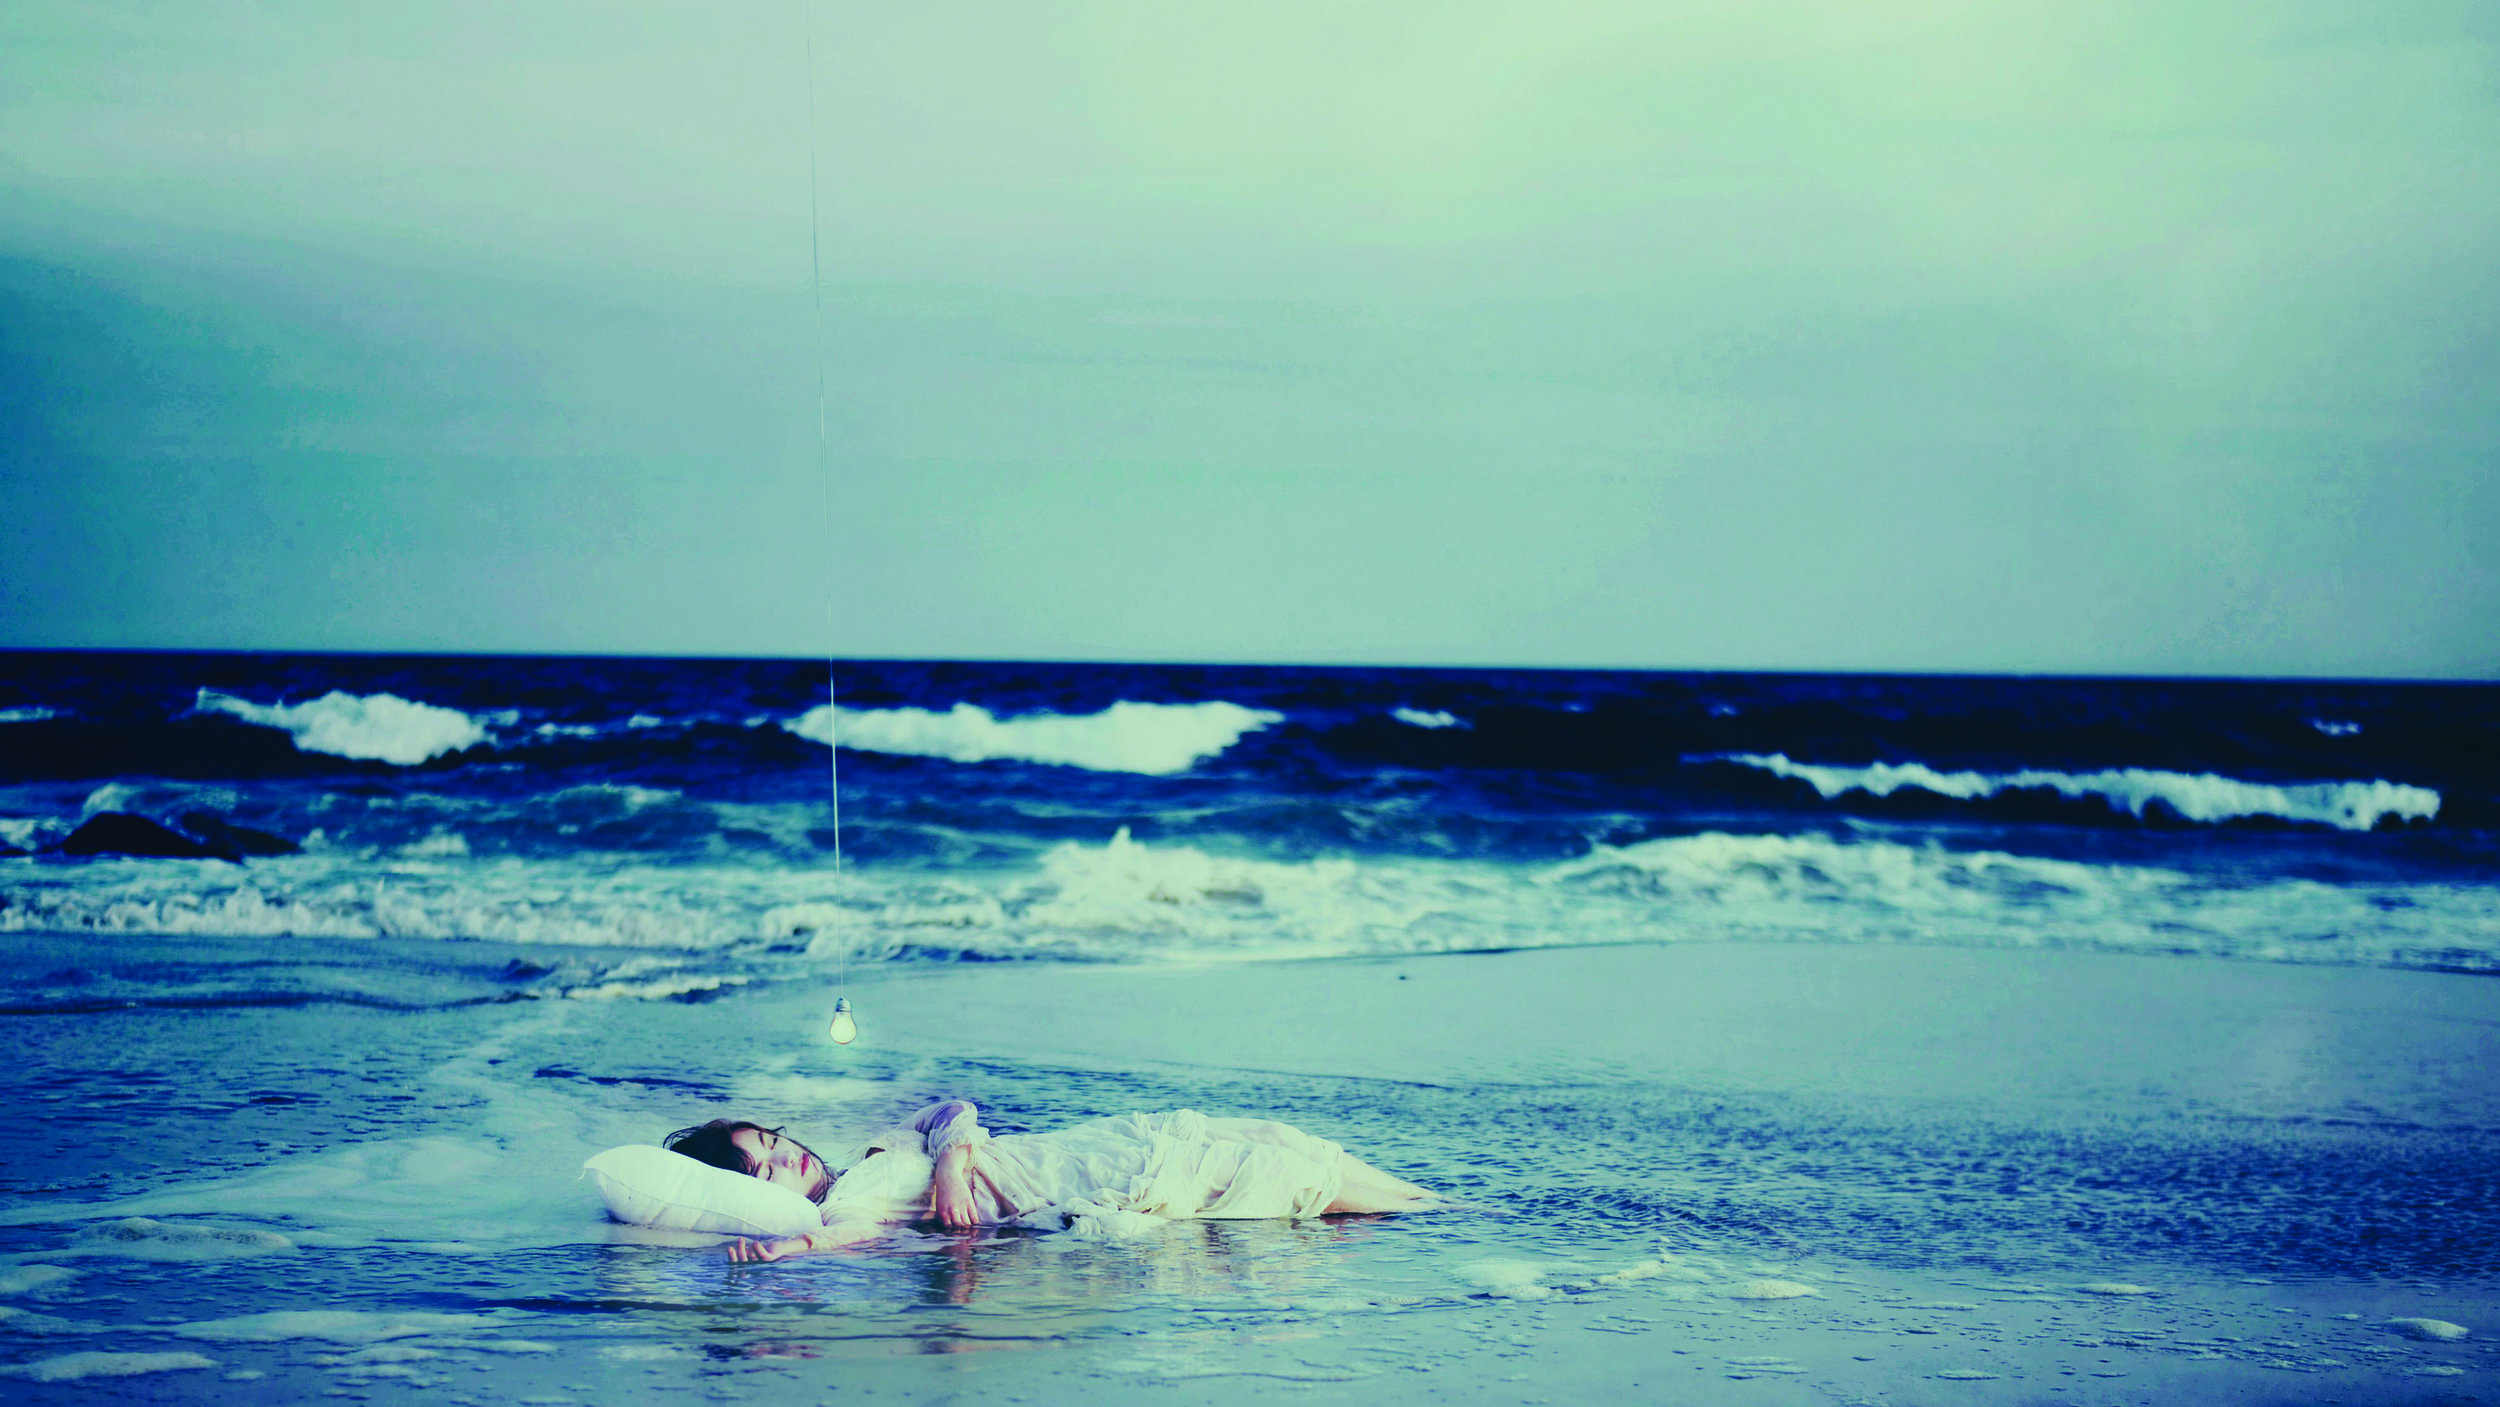 safe_to_shore.jpg